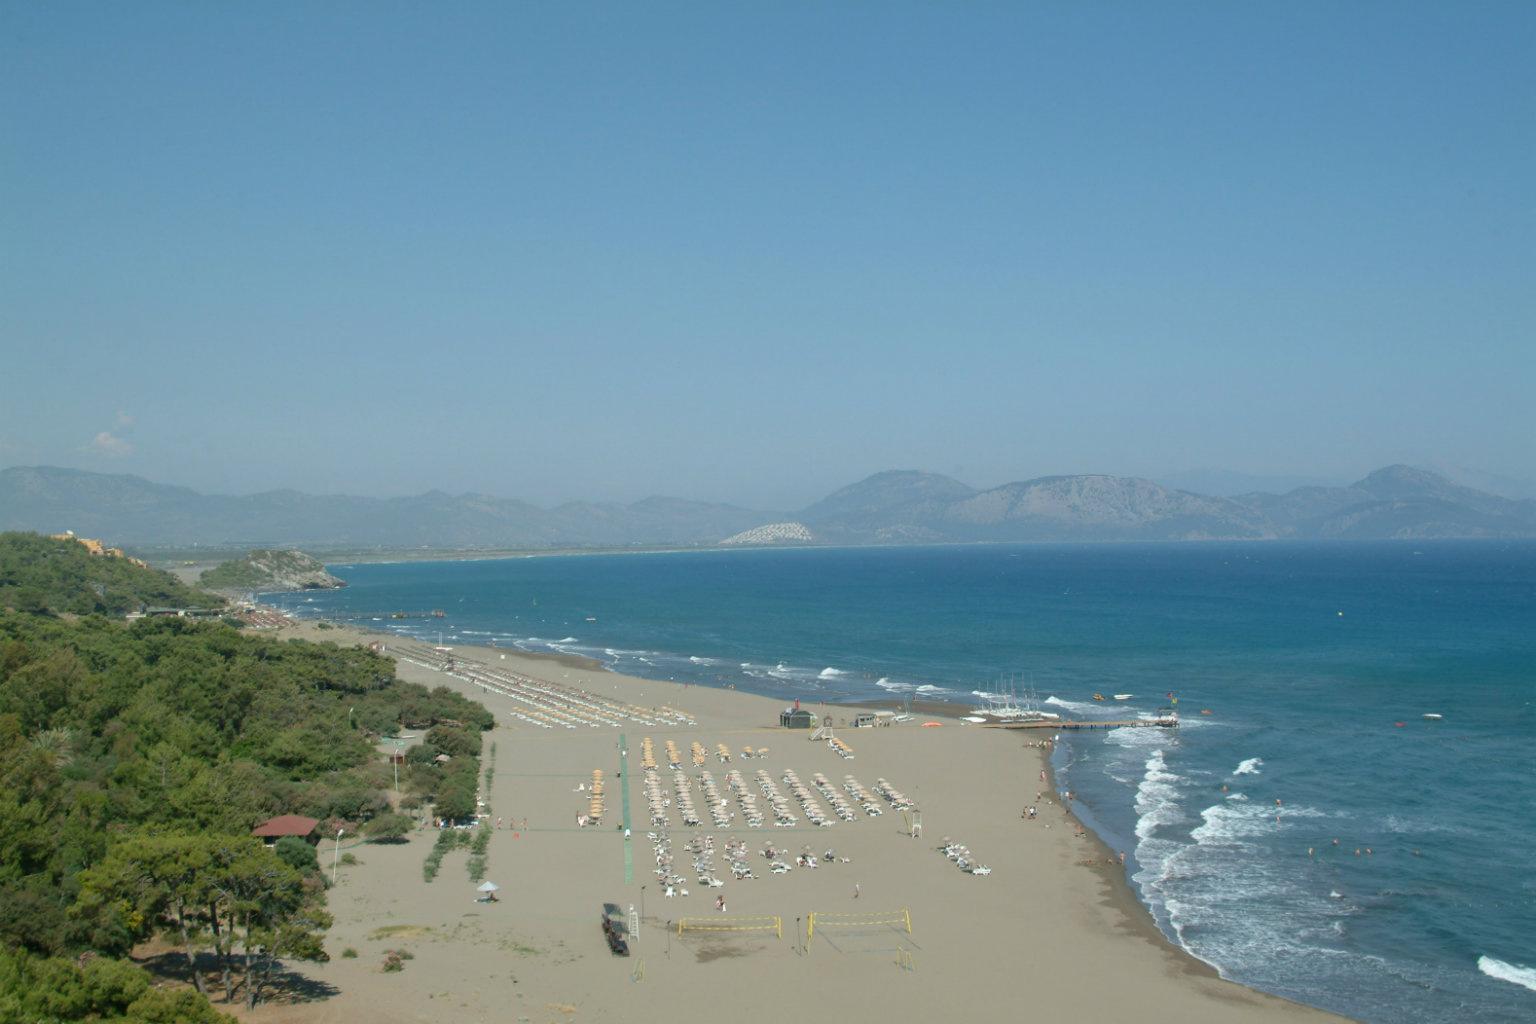 Sar�germe Otelleri